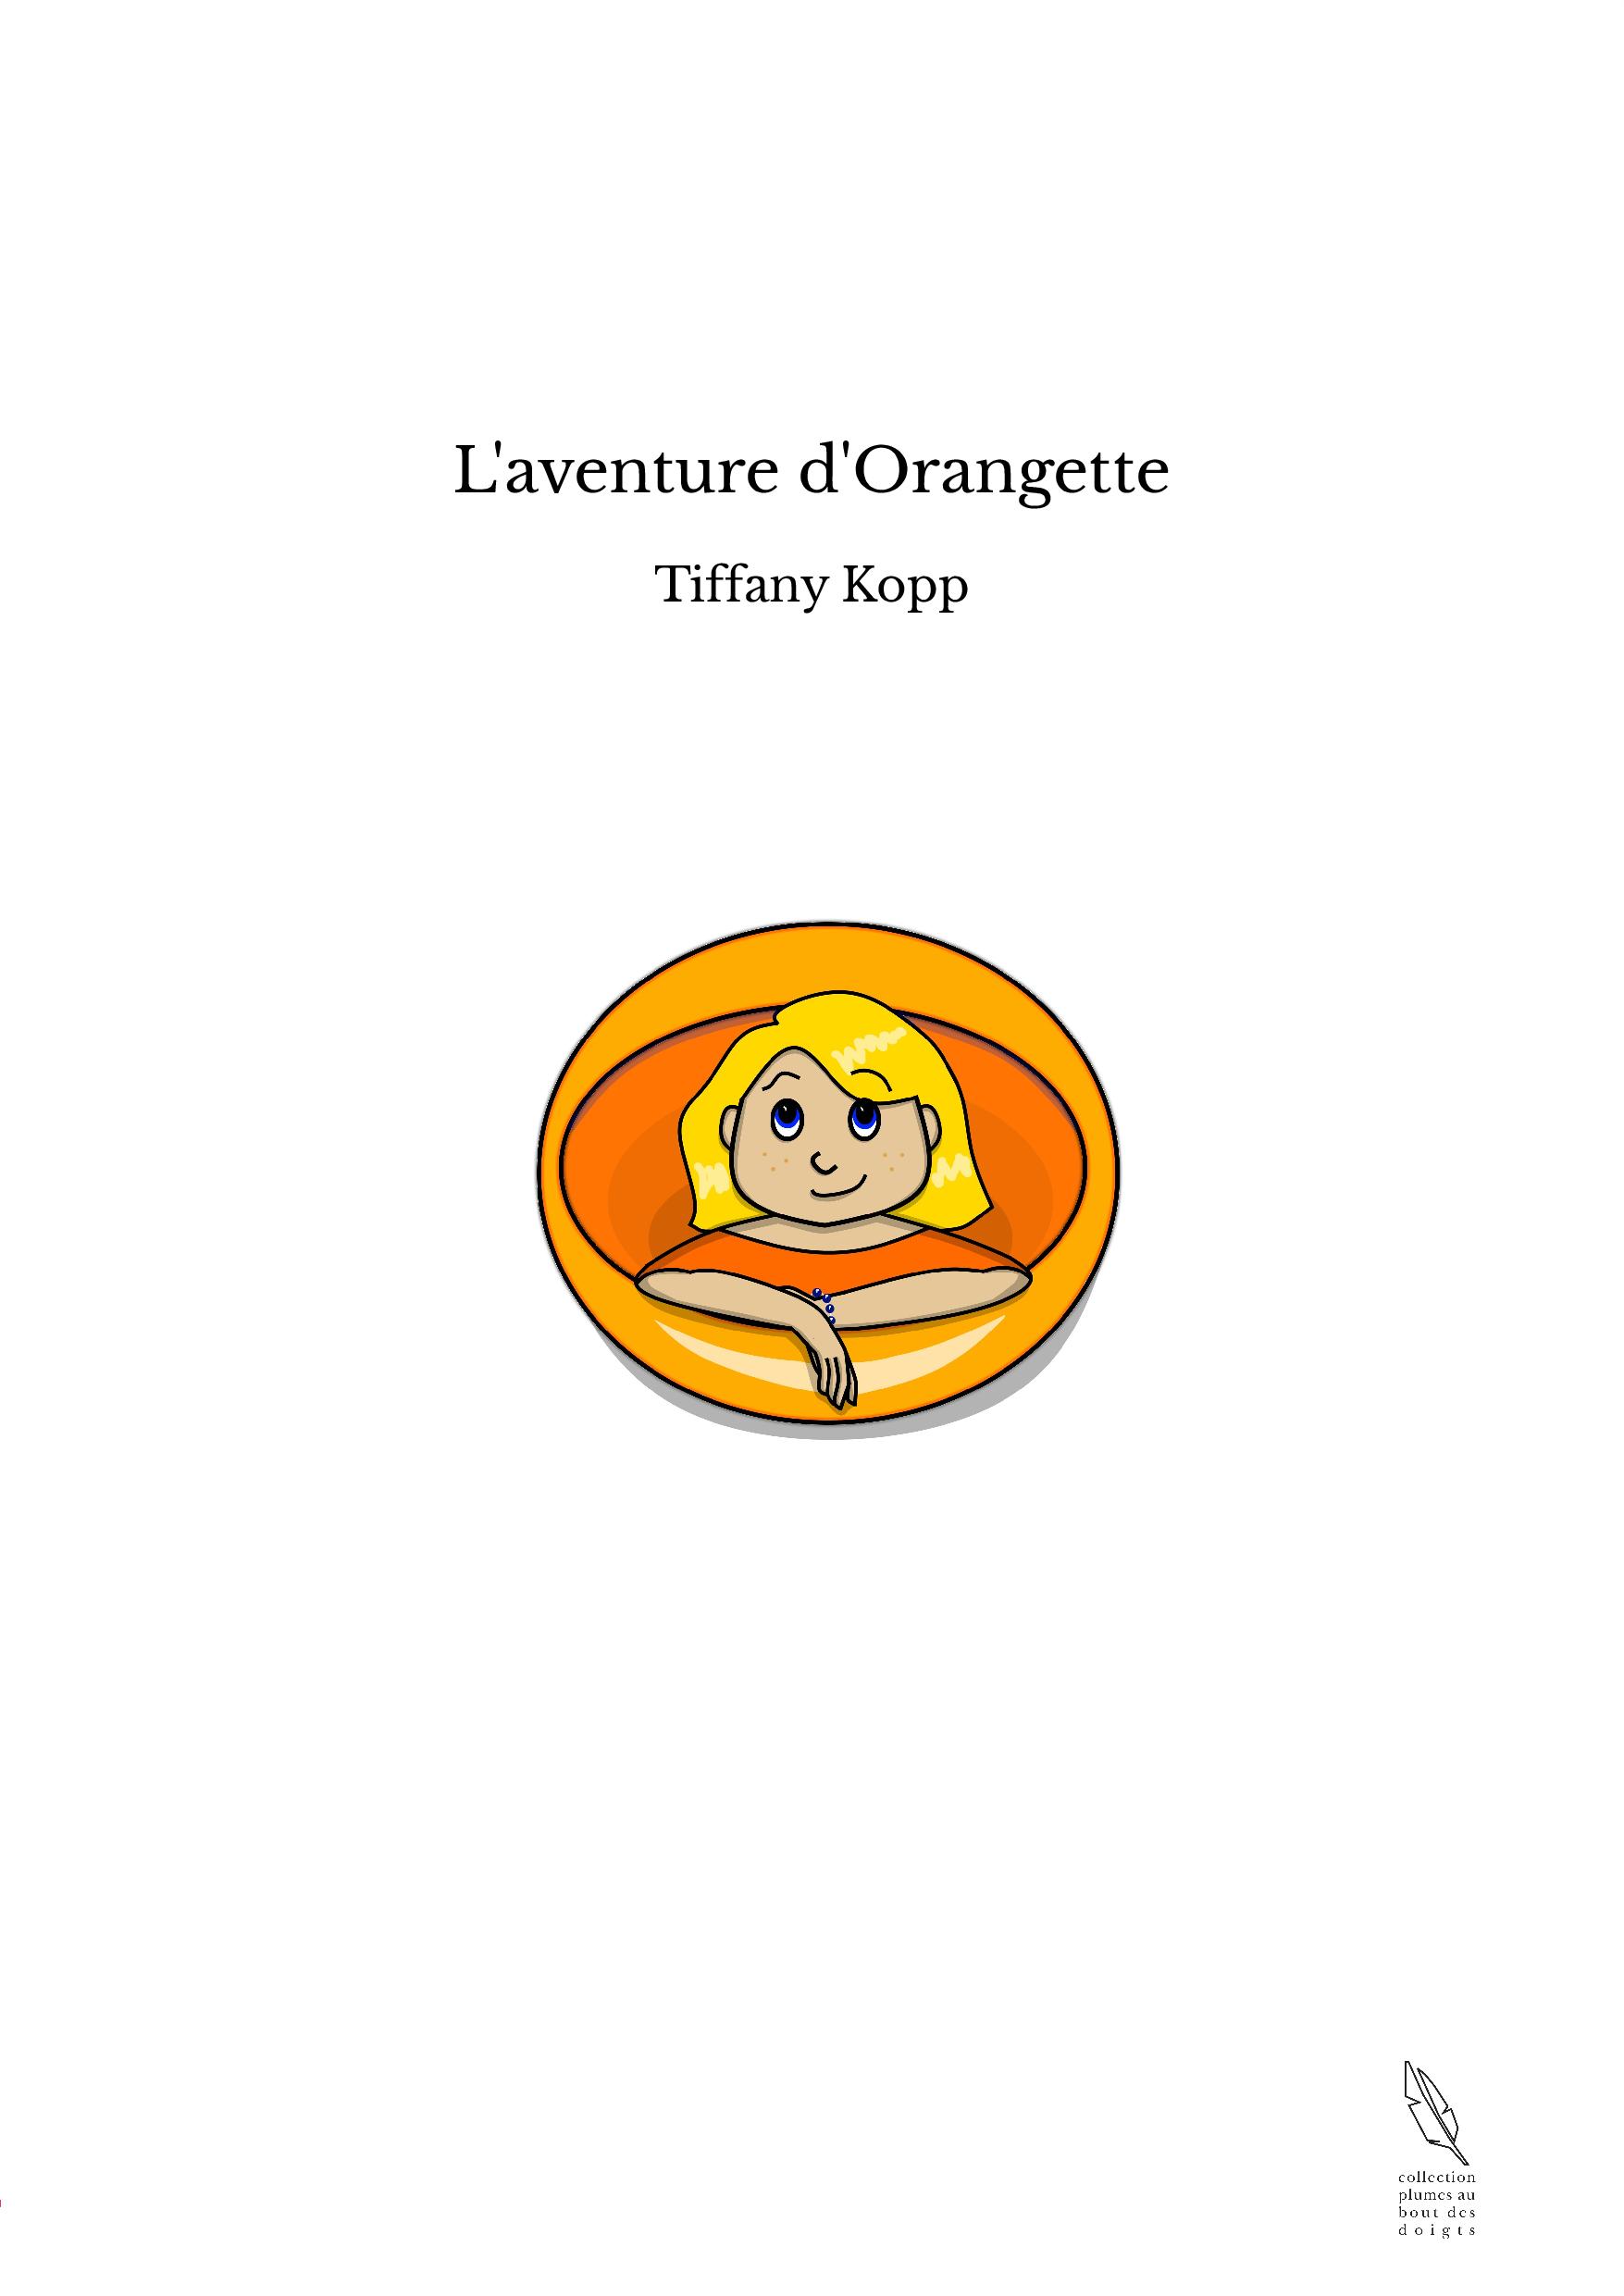 L'aventure d'Orangette